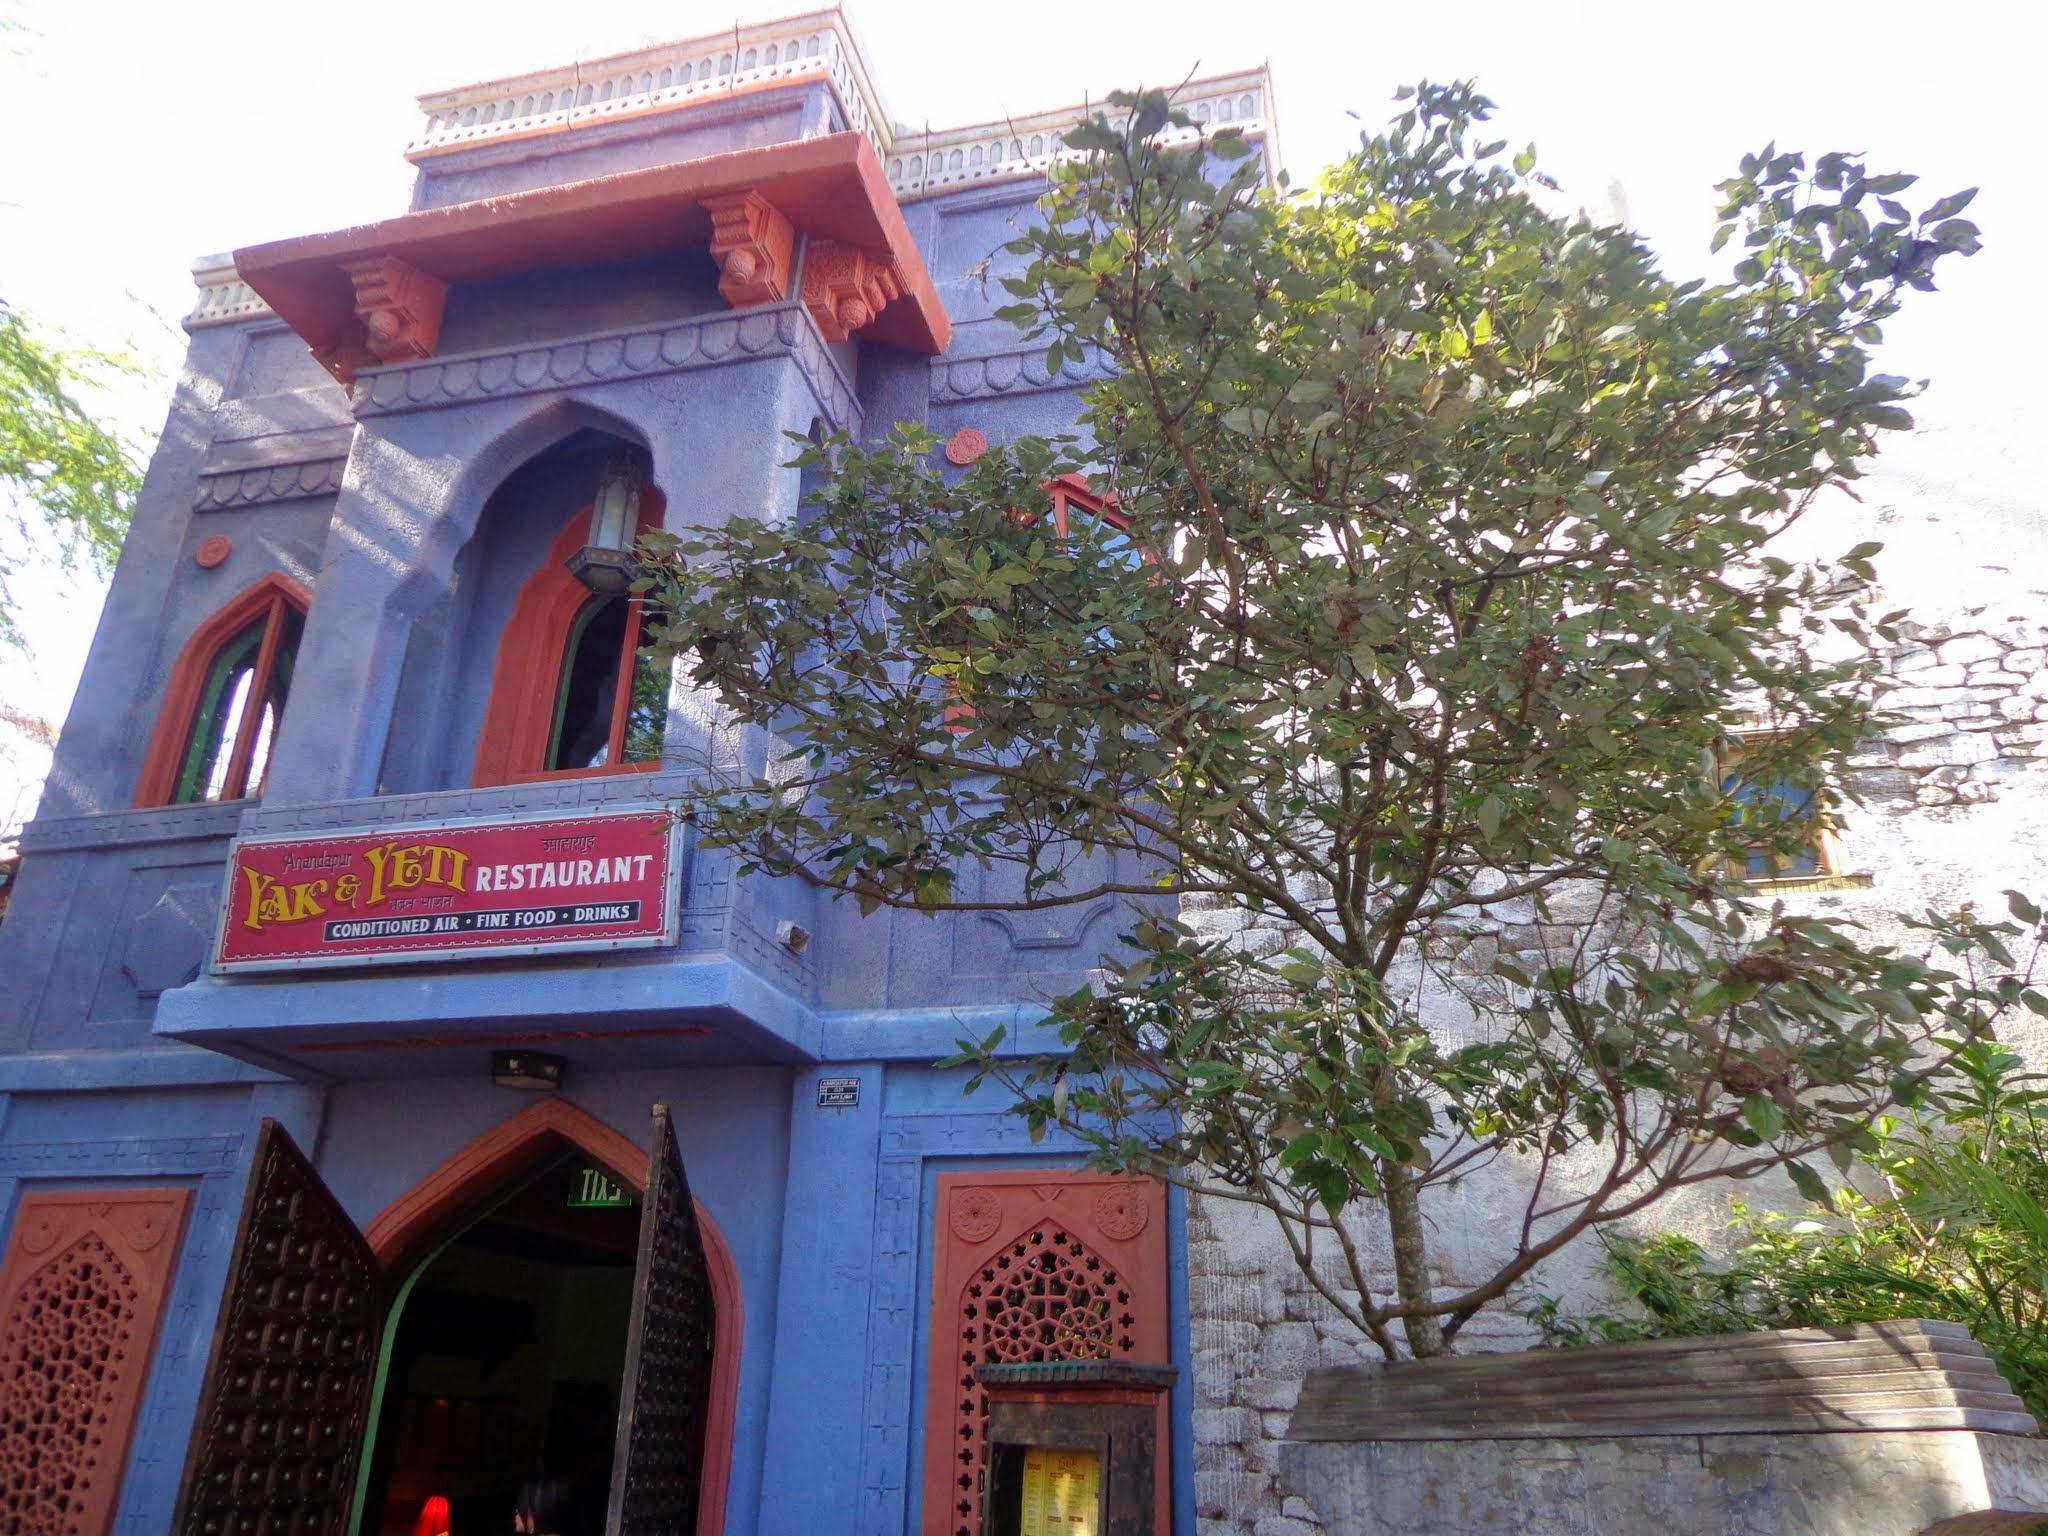 Review: Animal Kingdom's Yak and Yeti Restaurant